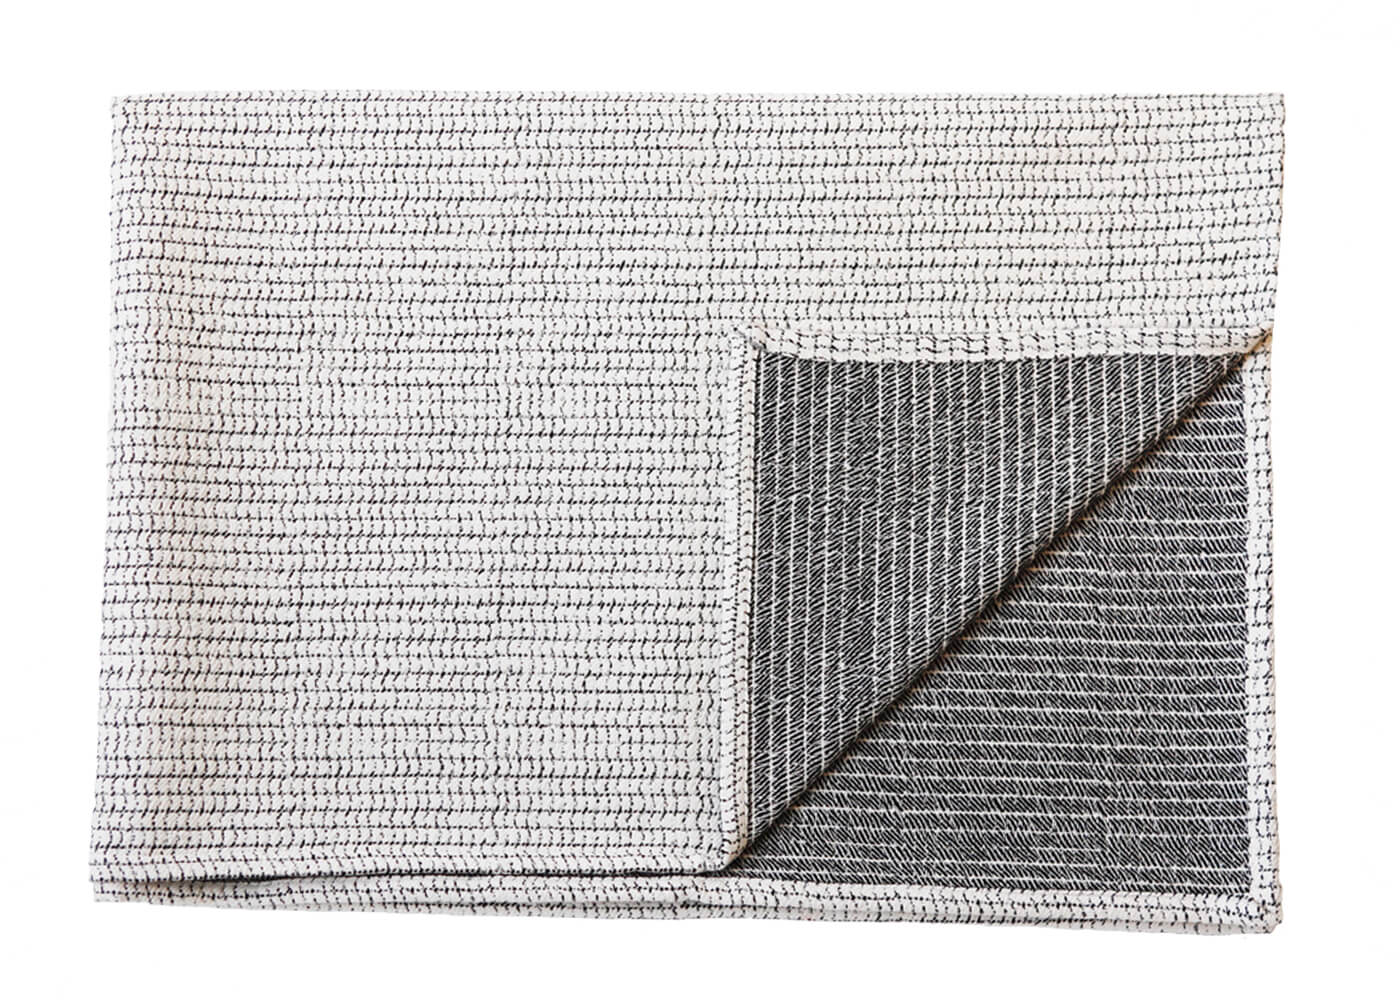 Beatrice Larkin Type Throw in Merino Wool. Beautiful Subtle Pattern